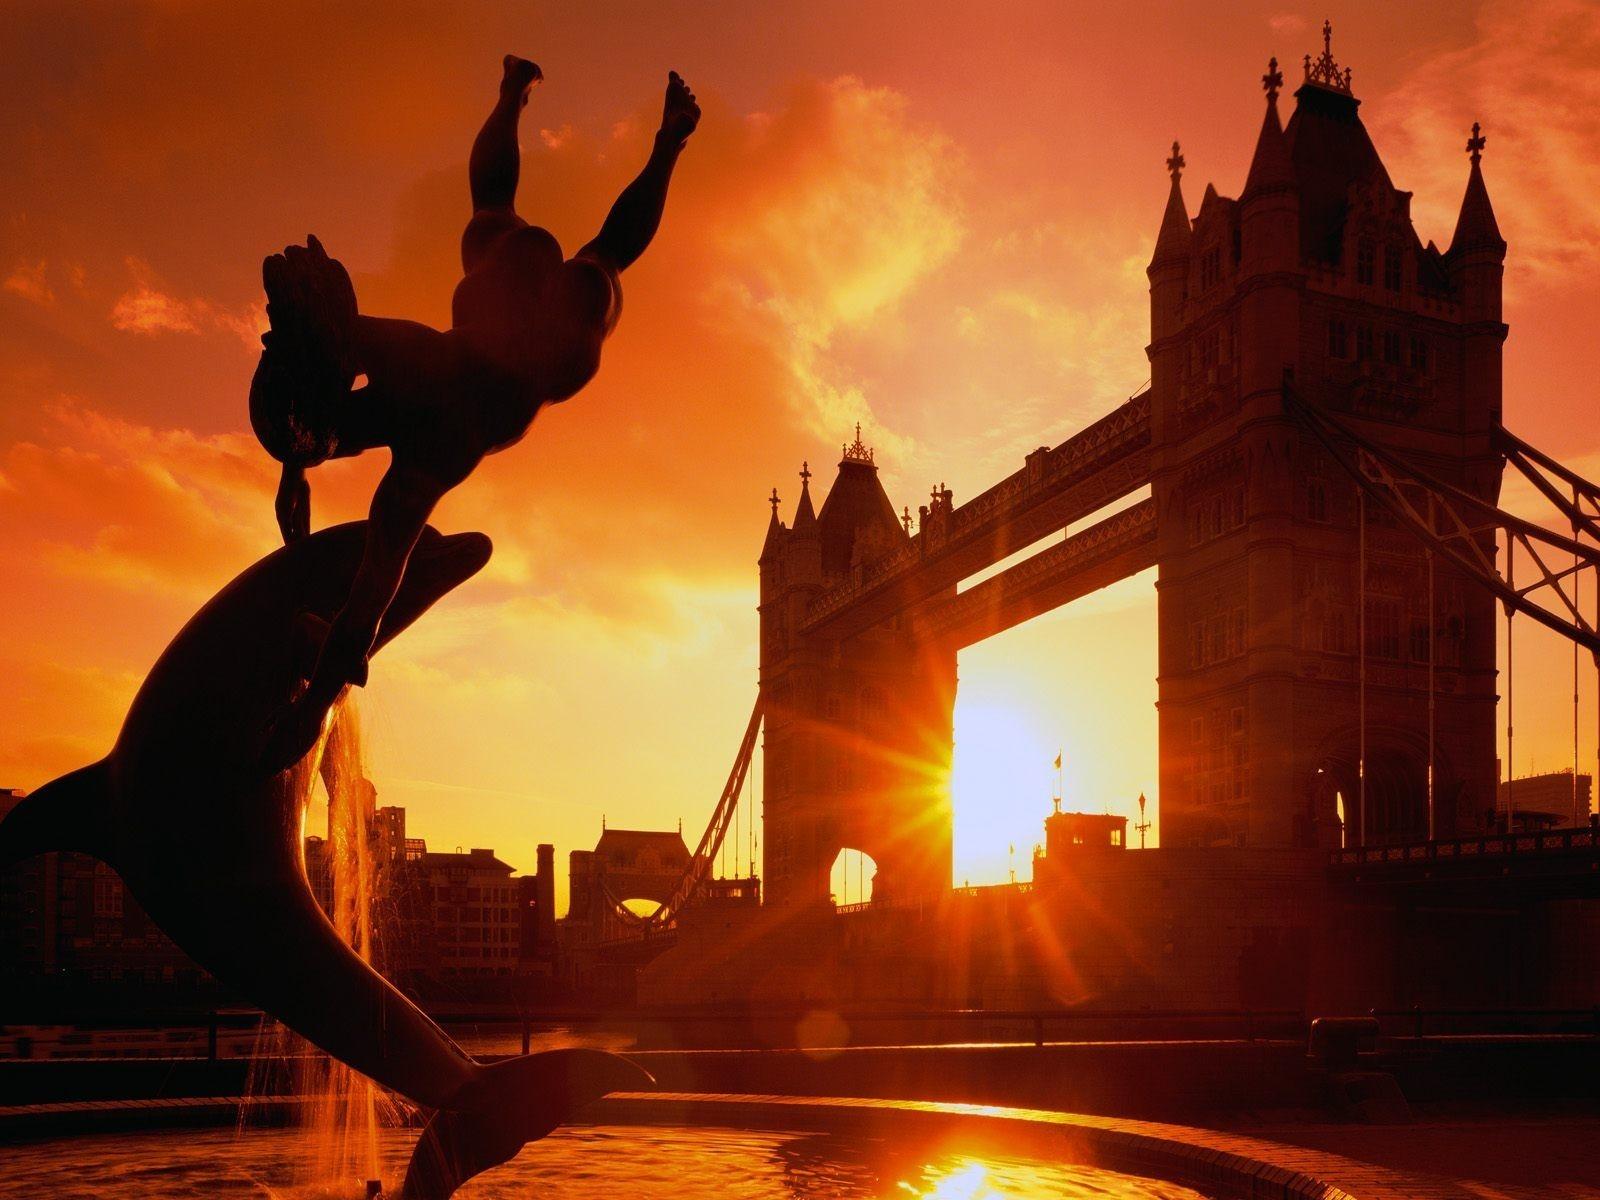 General 1600x1200 sunset sunlight Sun landscape building bridge city architecture silhouette dolphin London River Thames statue England UK